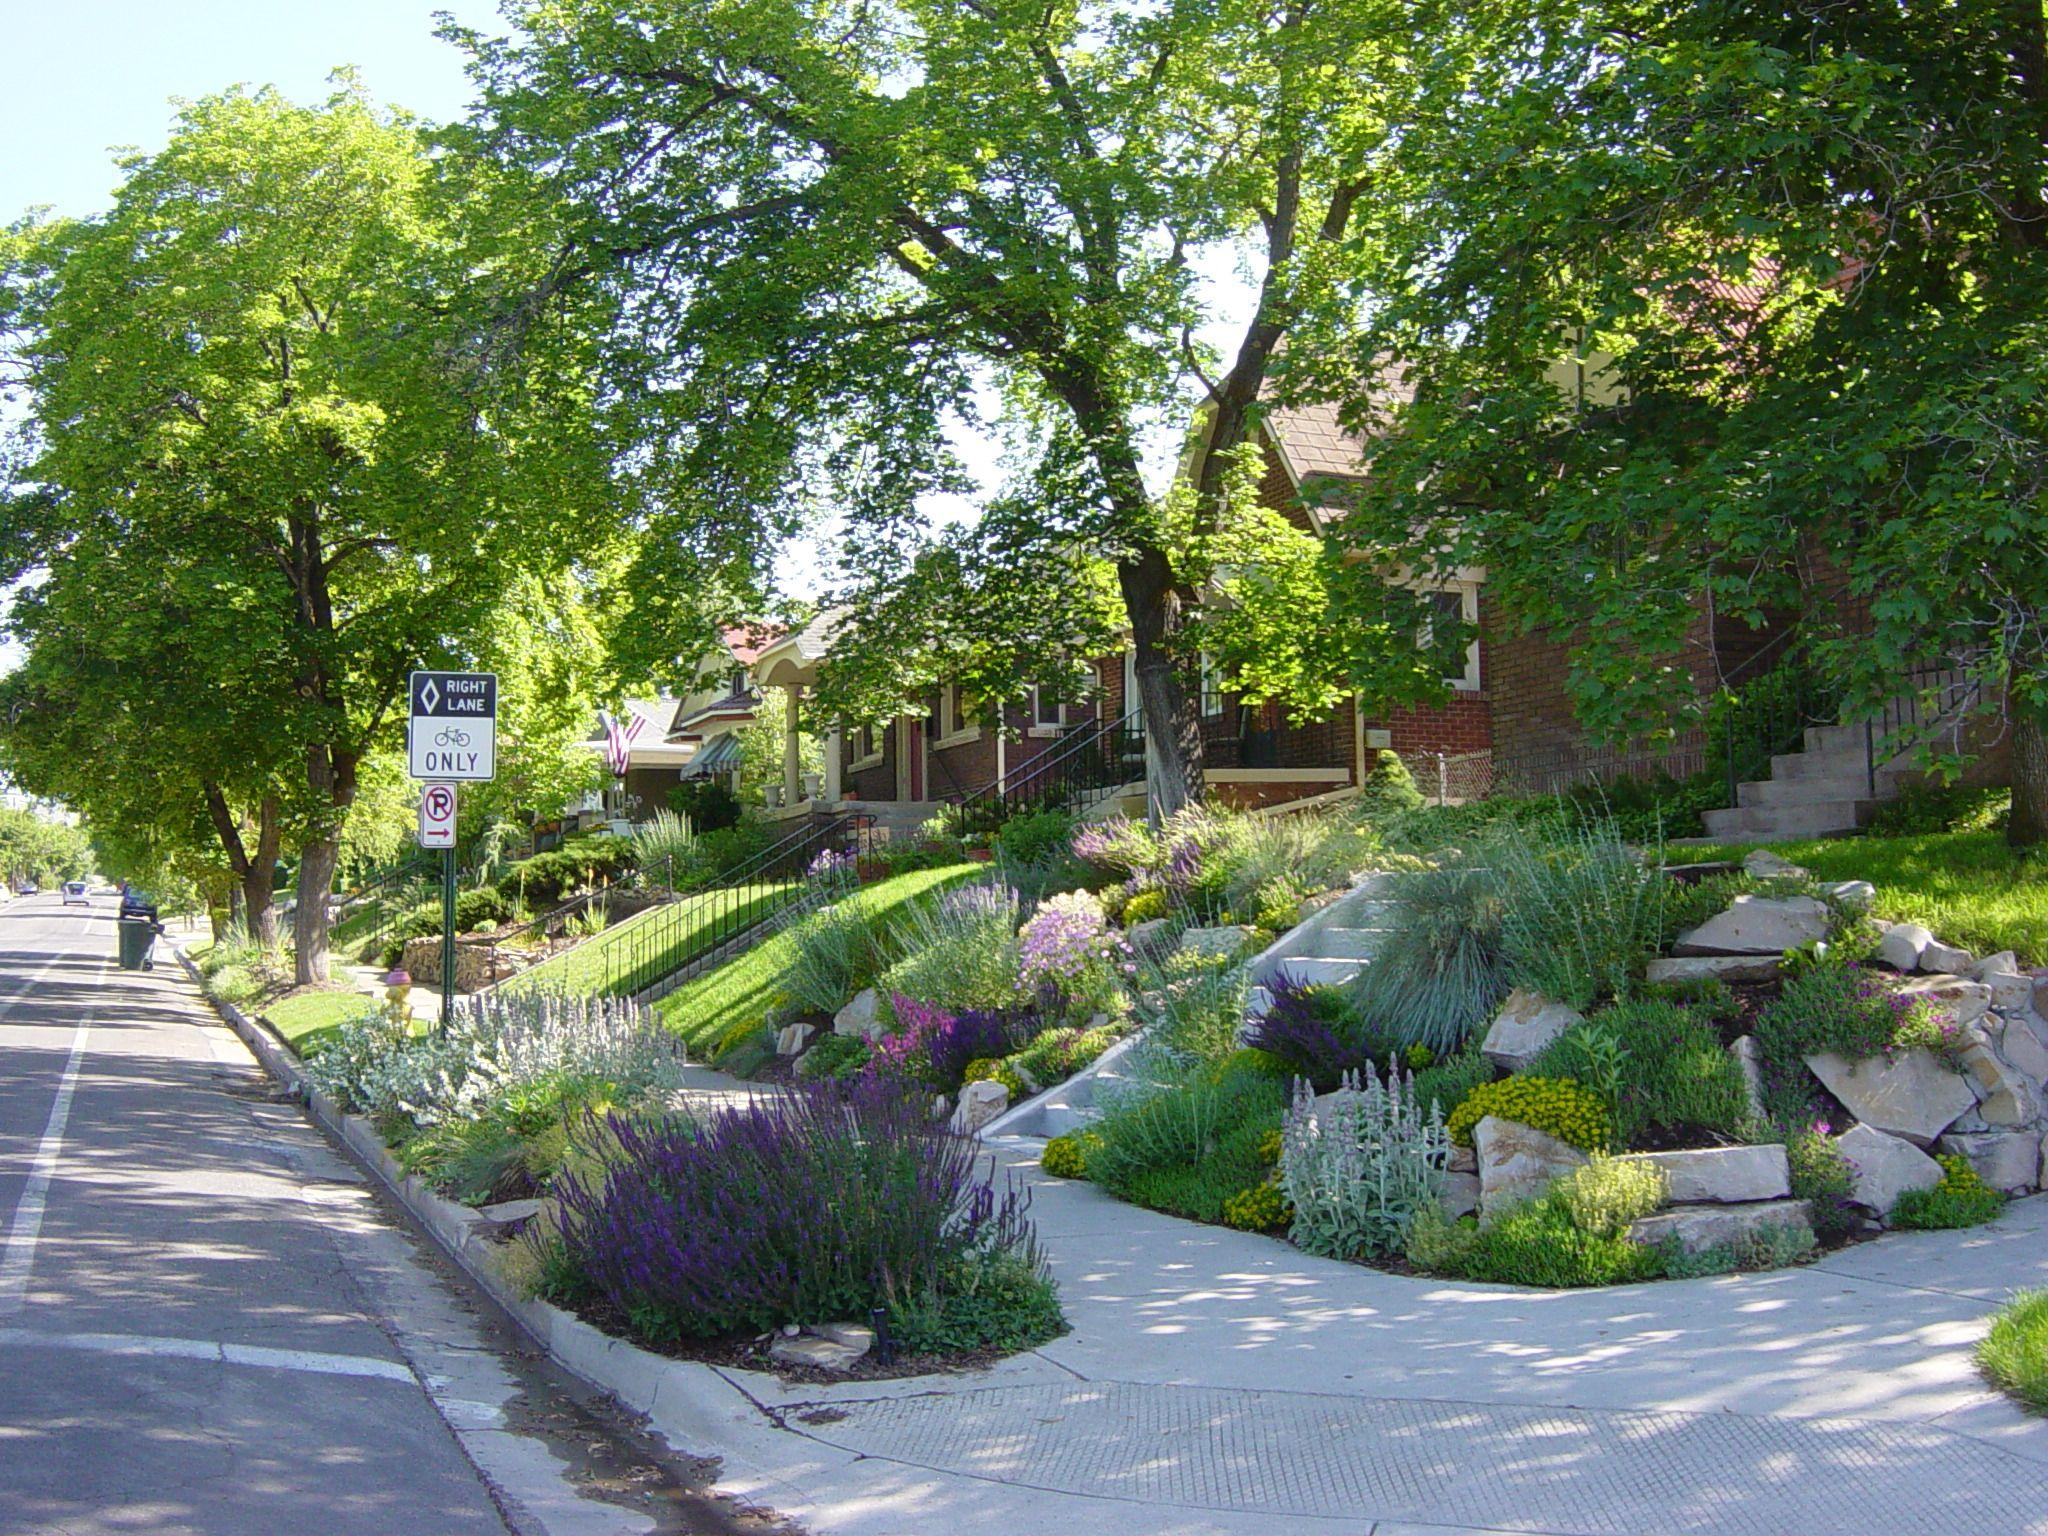 Front yard driveway landscaping ideas  Pass on the grass  garden  Pinterest  Grasses Gardens and Yard ideas